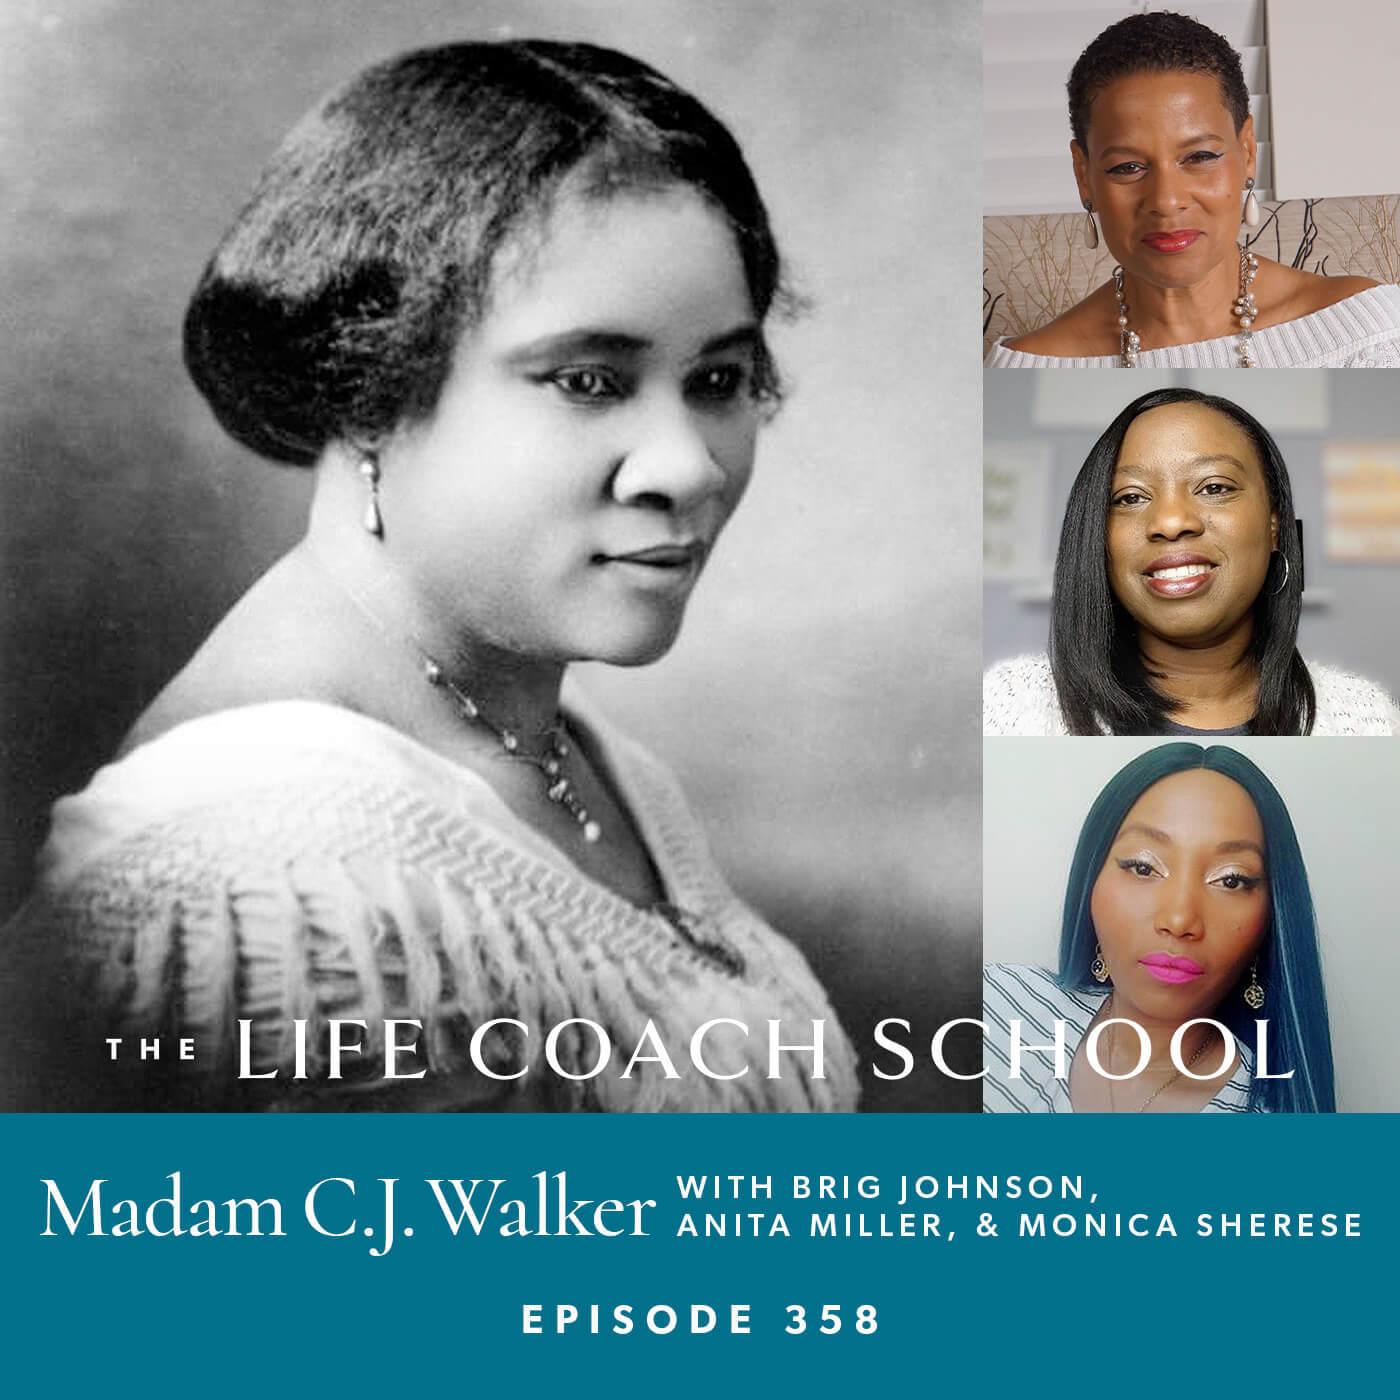 Ep #358: Madam C.J. Walker with Brig Johnson, Anita Miller, and Monica Sherese